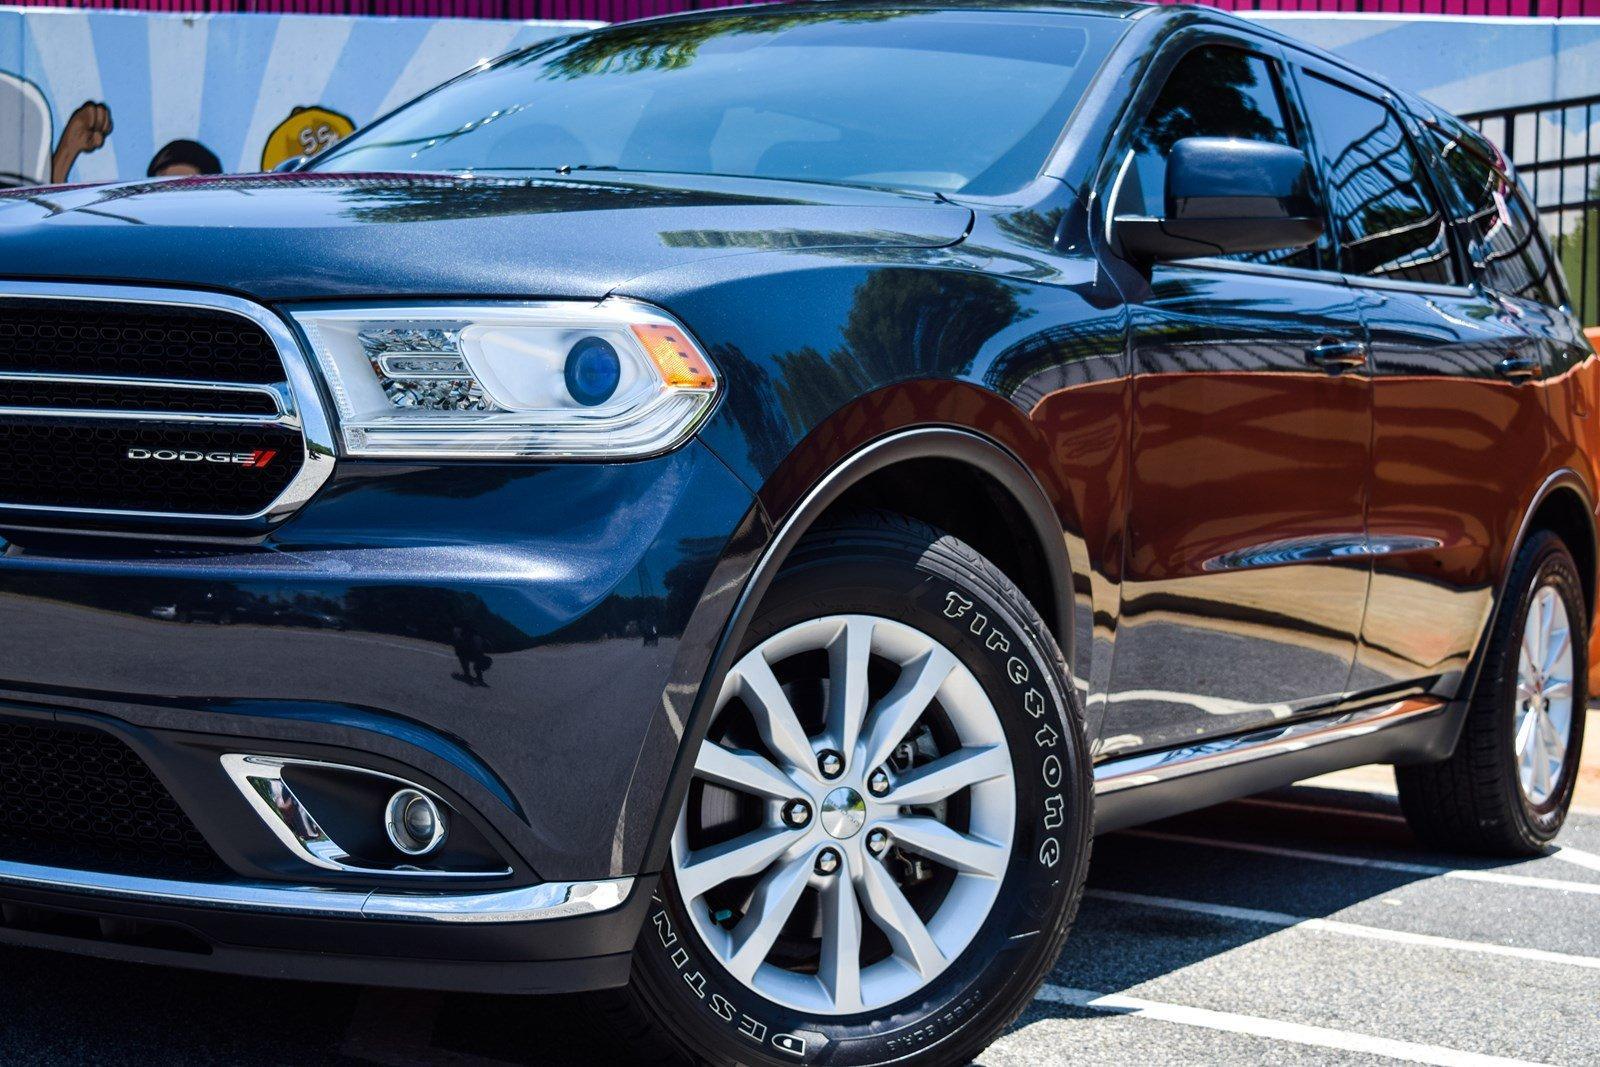 2014 Dodge Durango Sxt Stock 513818 For Sale Near Sandy Springs Ga Ga Dodge Dealer